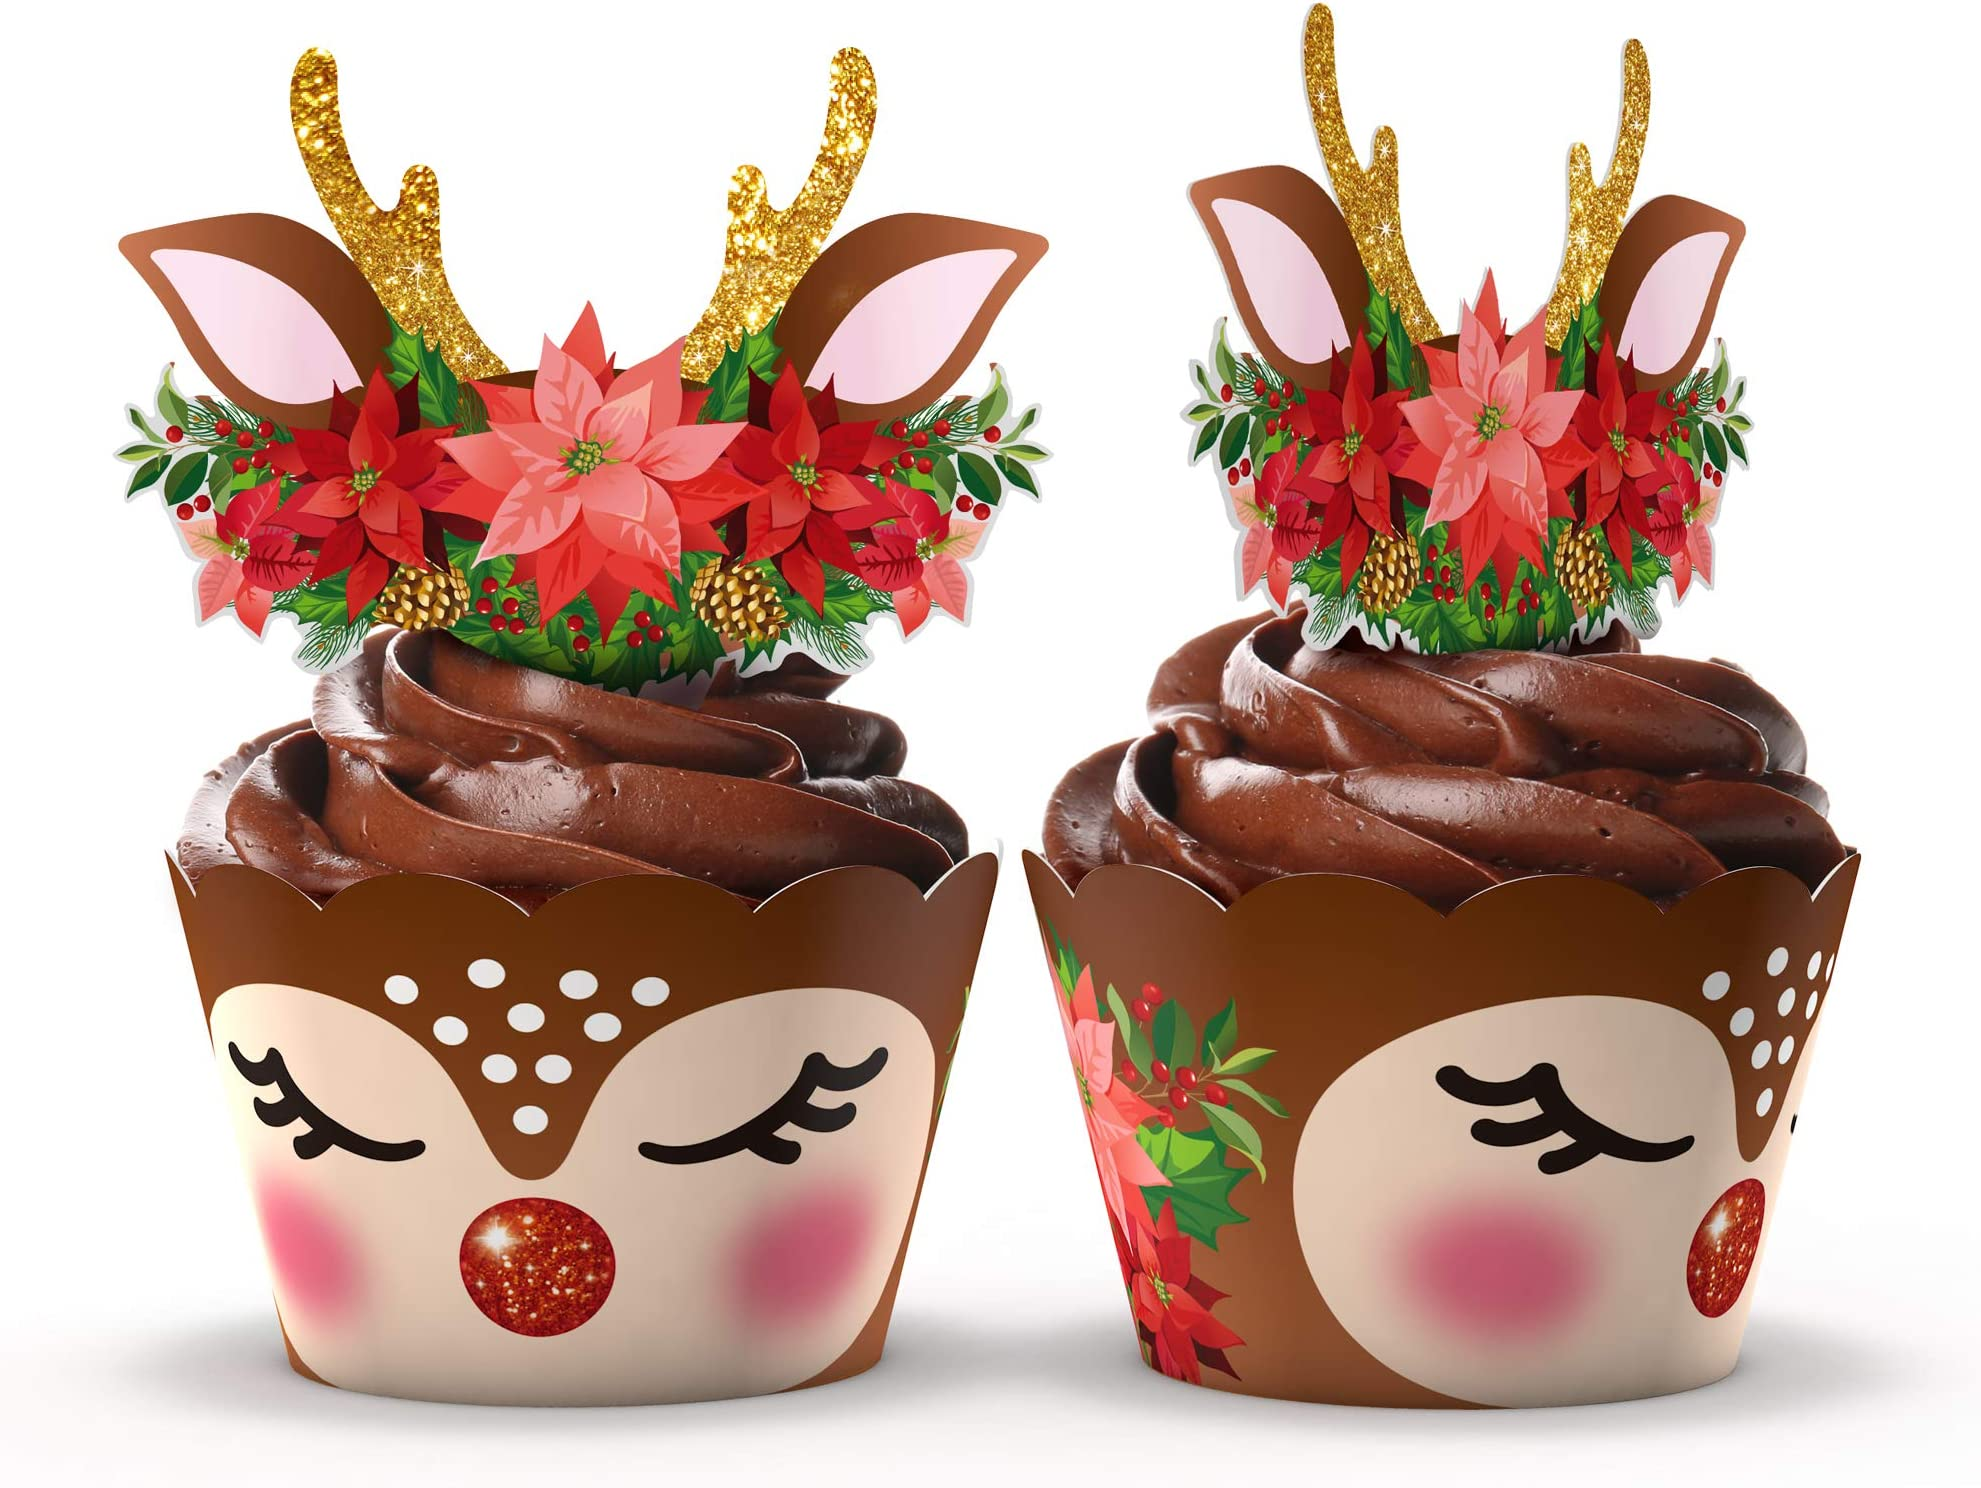 2 Merry Christmas Cake Cupcake Plaques